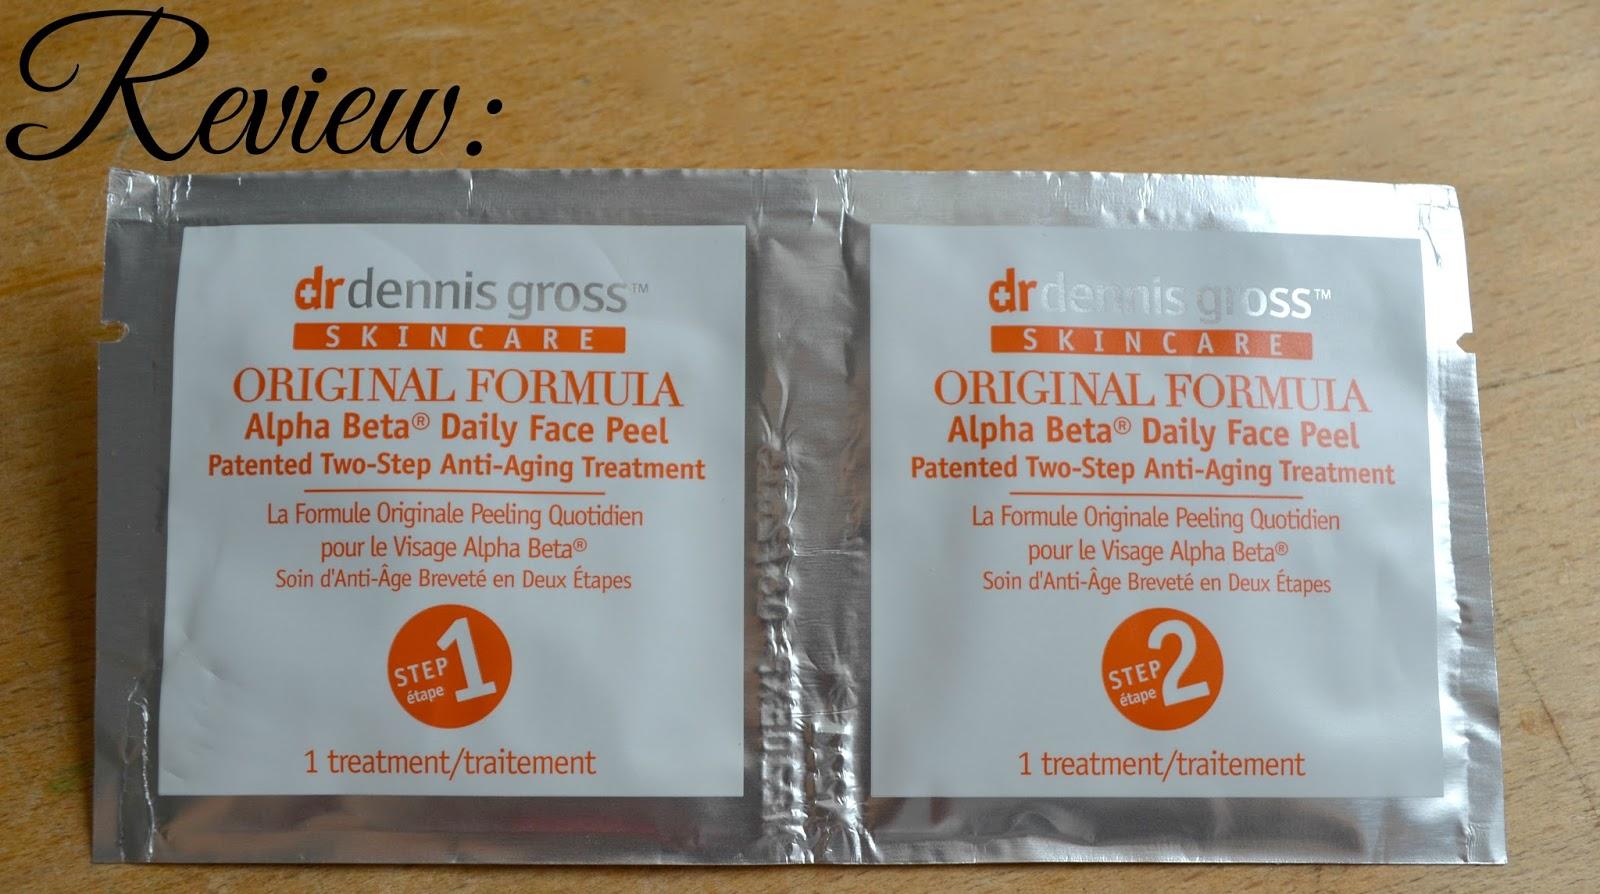 Beauty Review: Dr Dennis Gross Alpha Beta Daily Face Peel